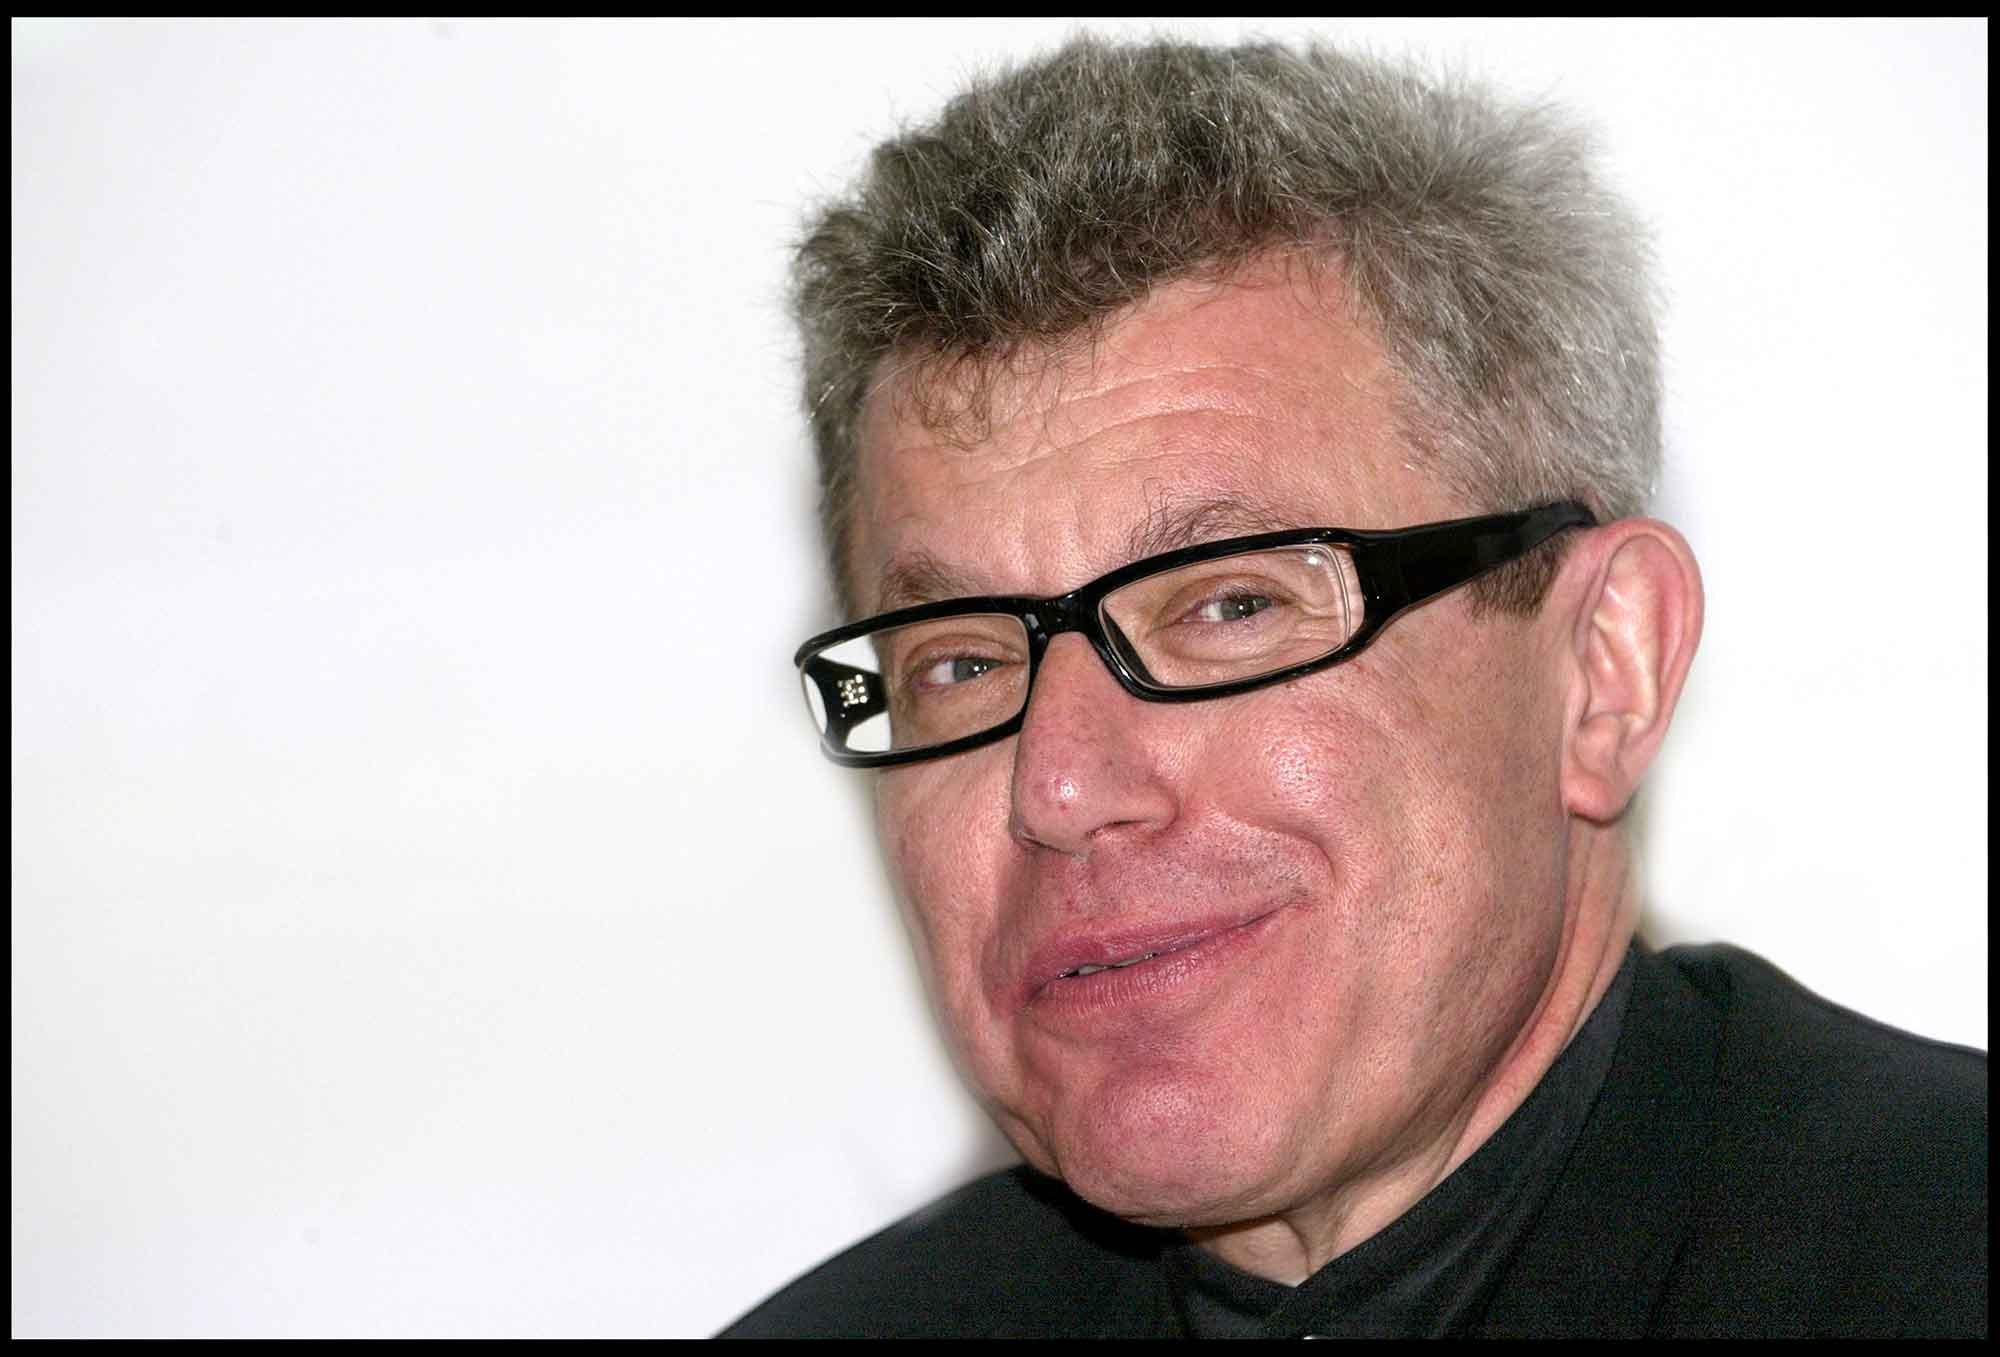 Den verdenskendte stjernearkitekt Daniel Liebeskind